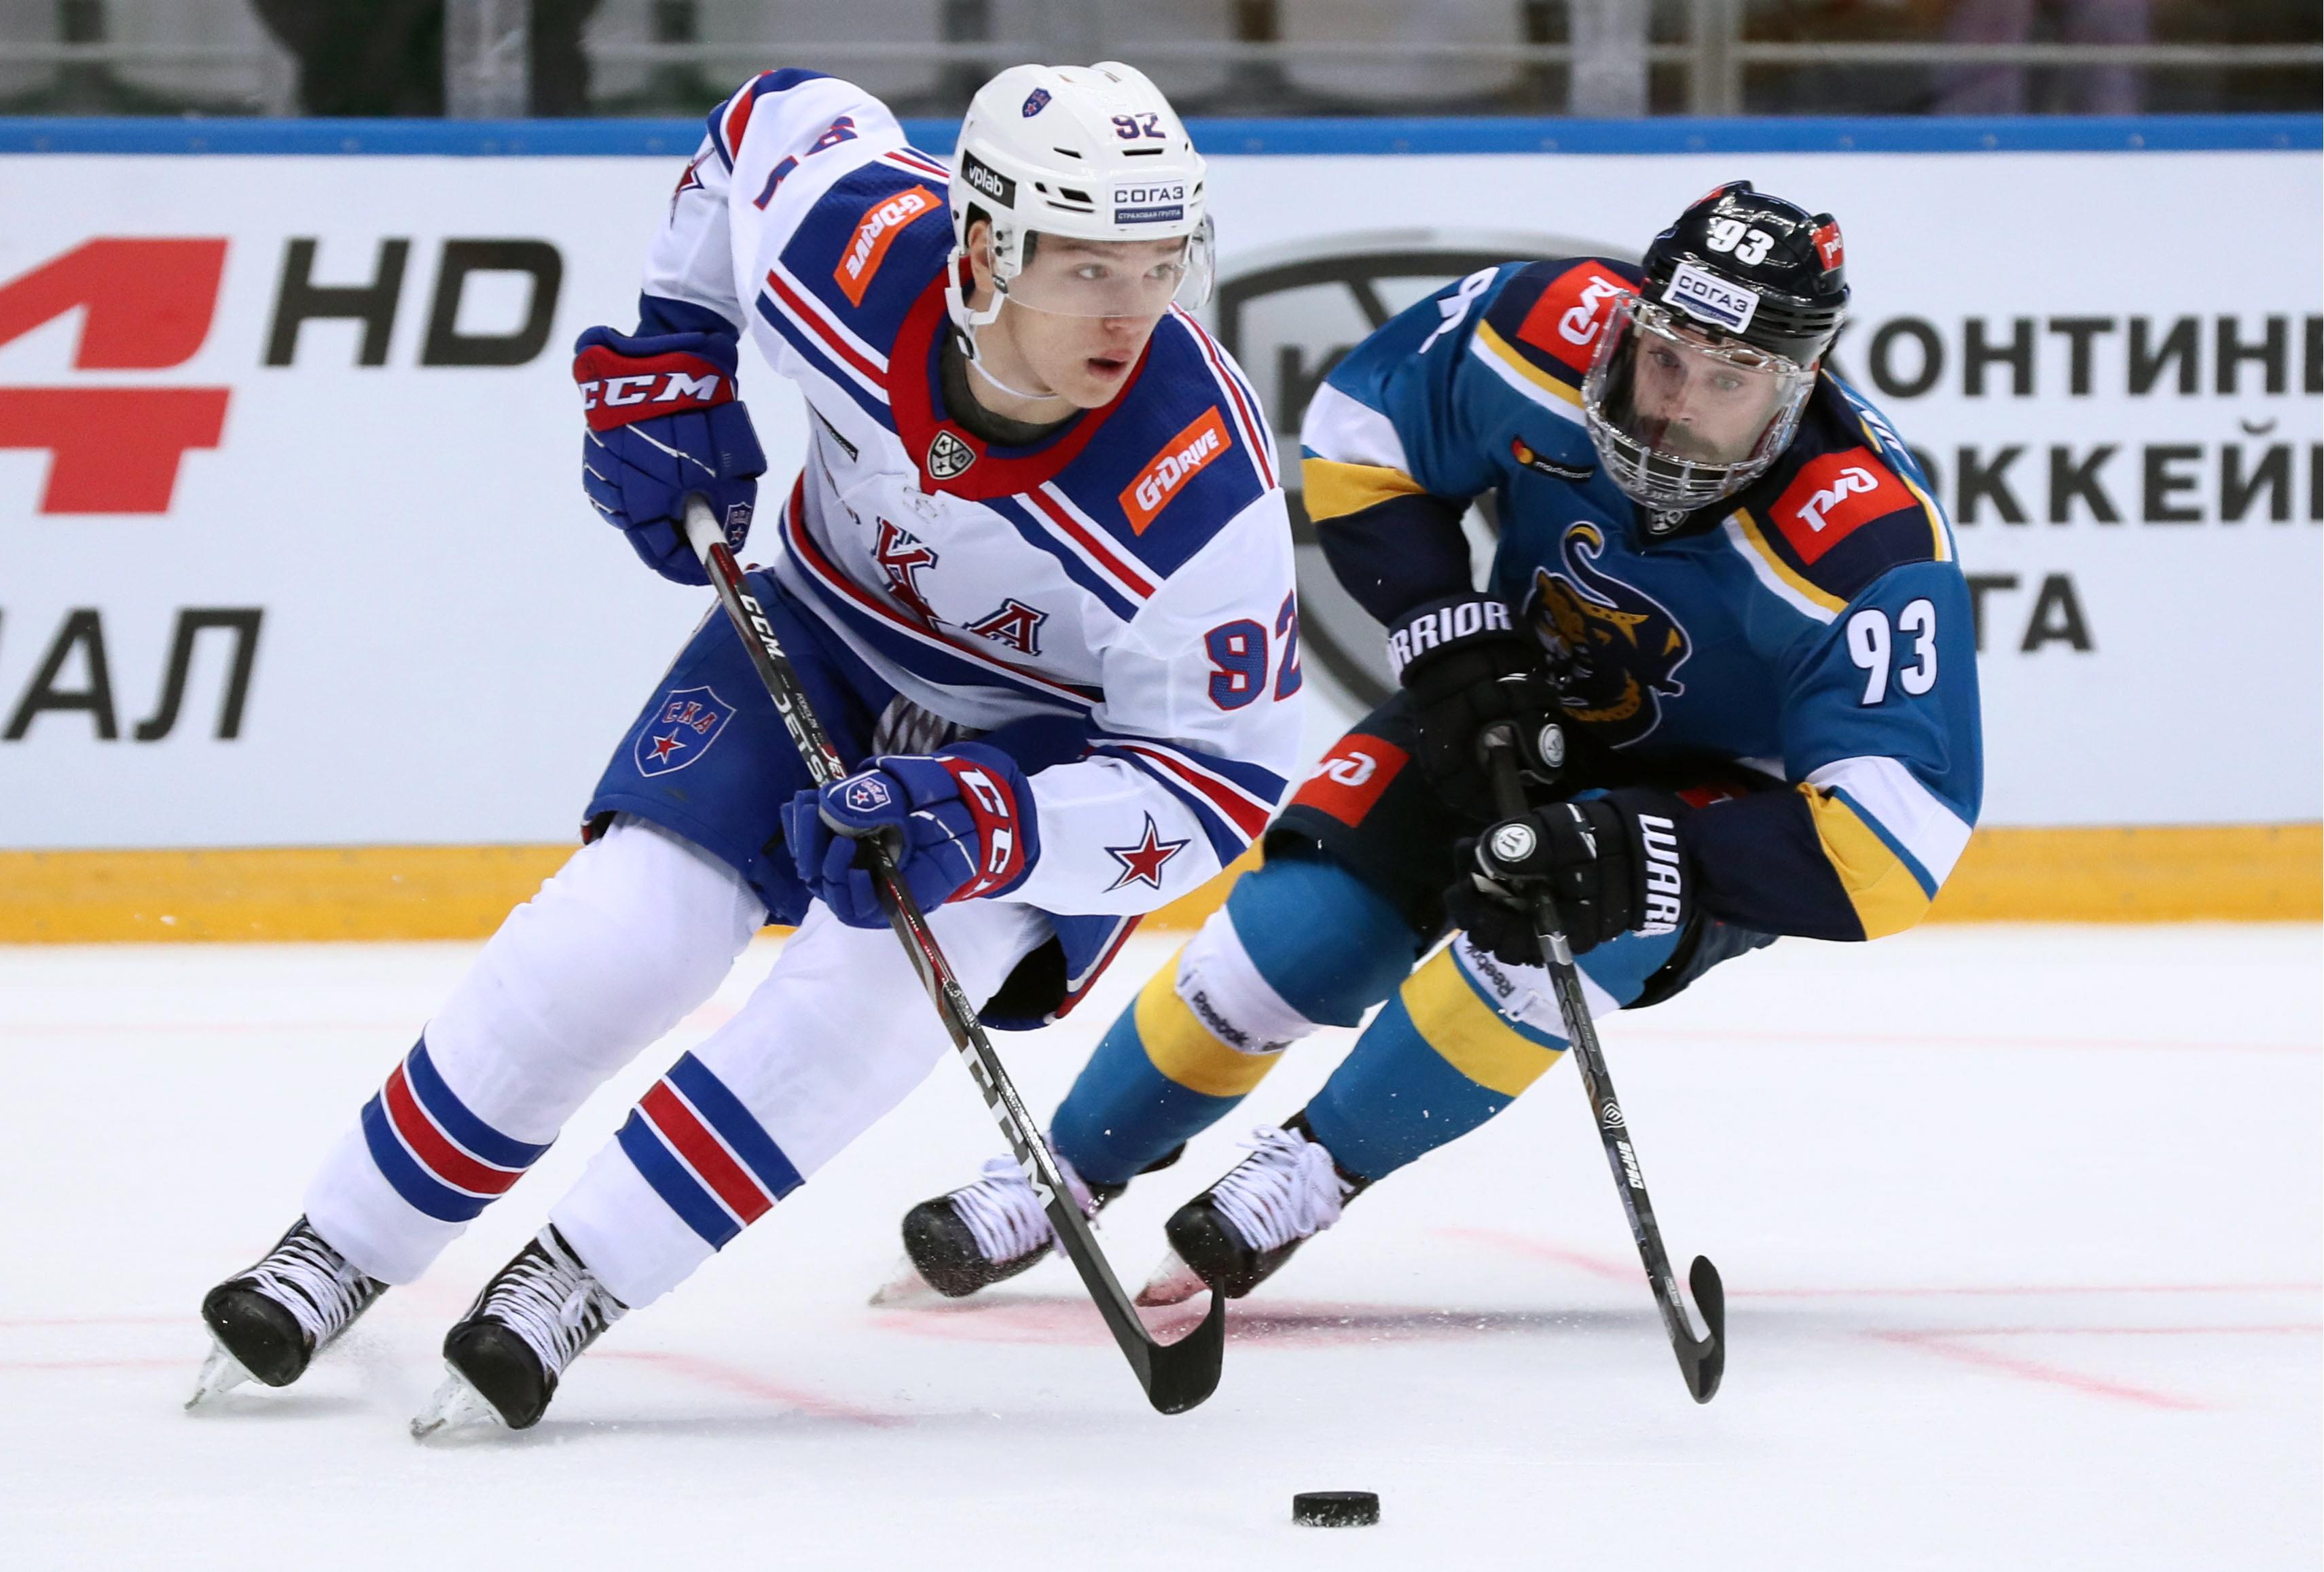 Kontinental Hockey League: HC Sochi vs SKA St Petersburg